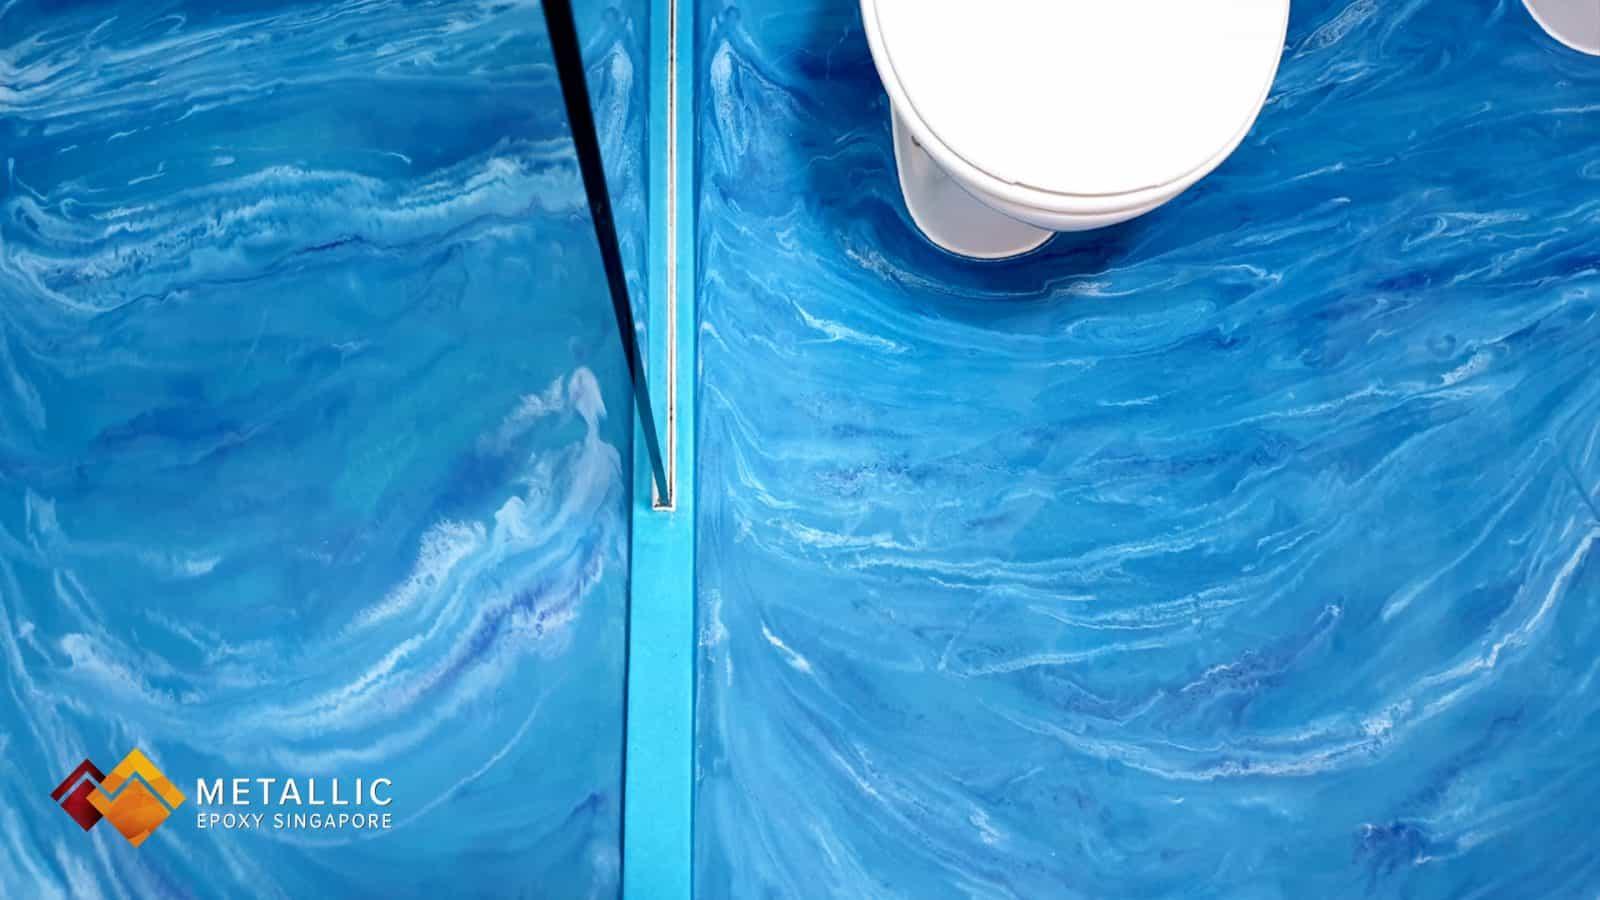 Metallic epoxy singapore blue waves bathroom floor